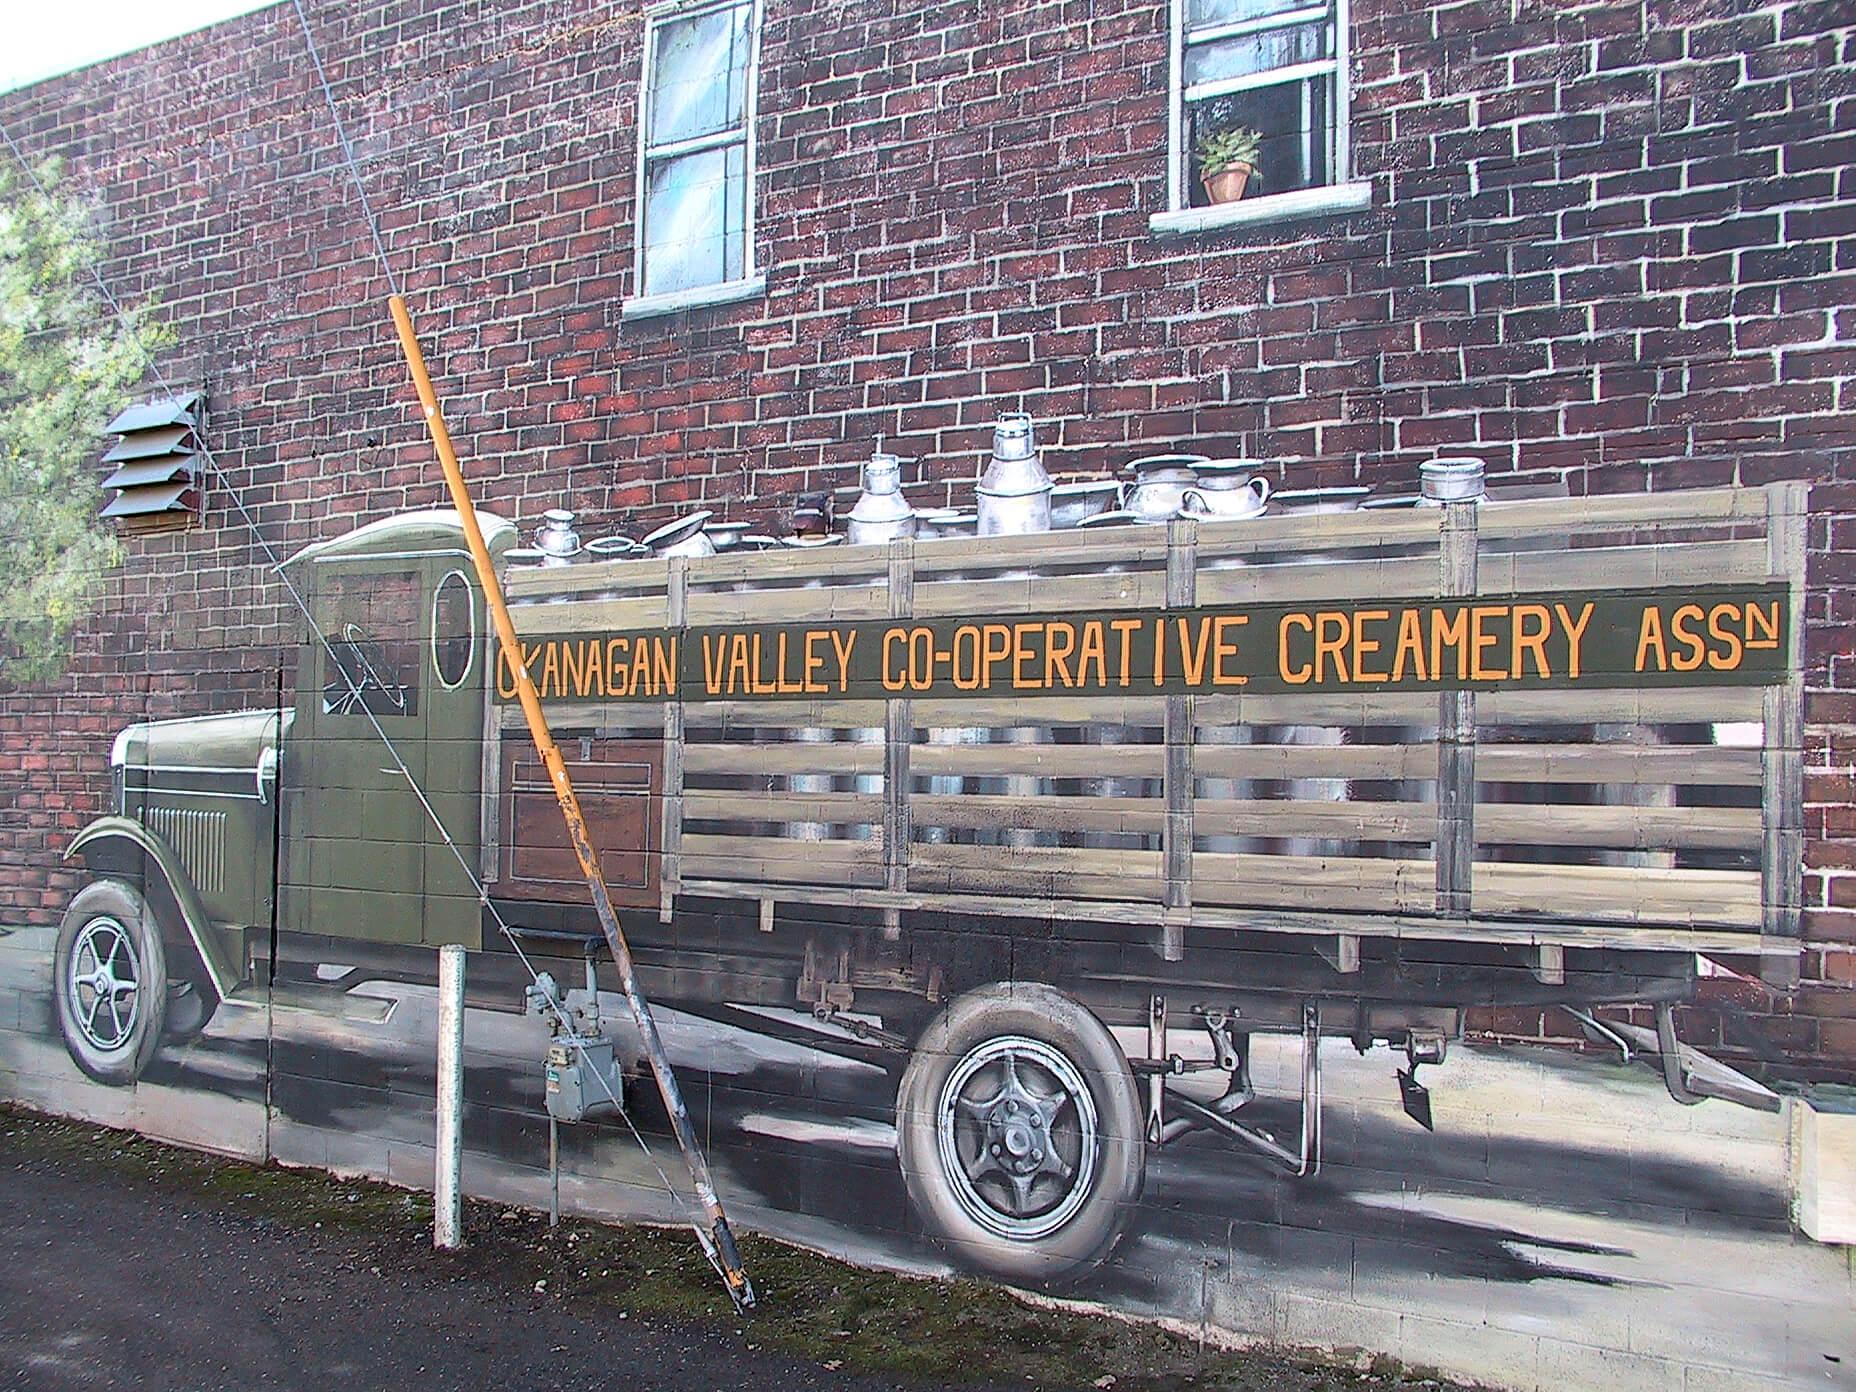 Creamery Truck